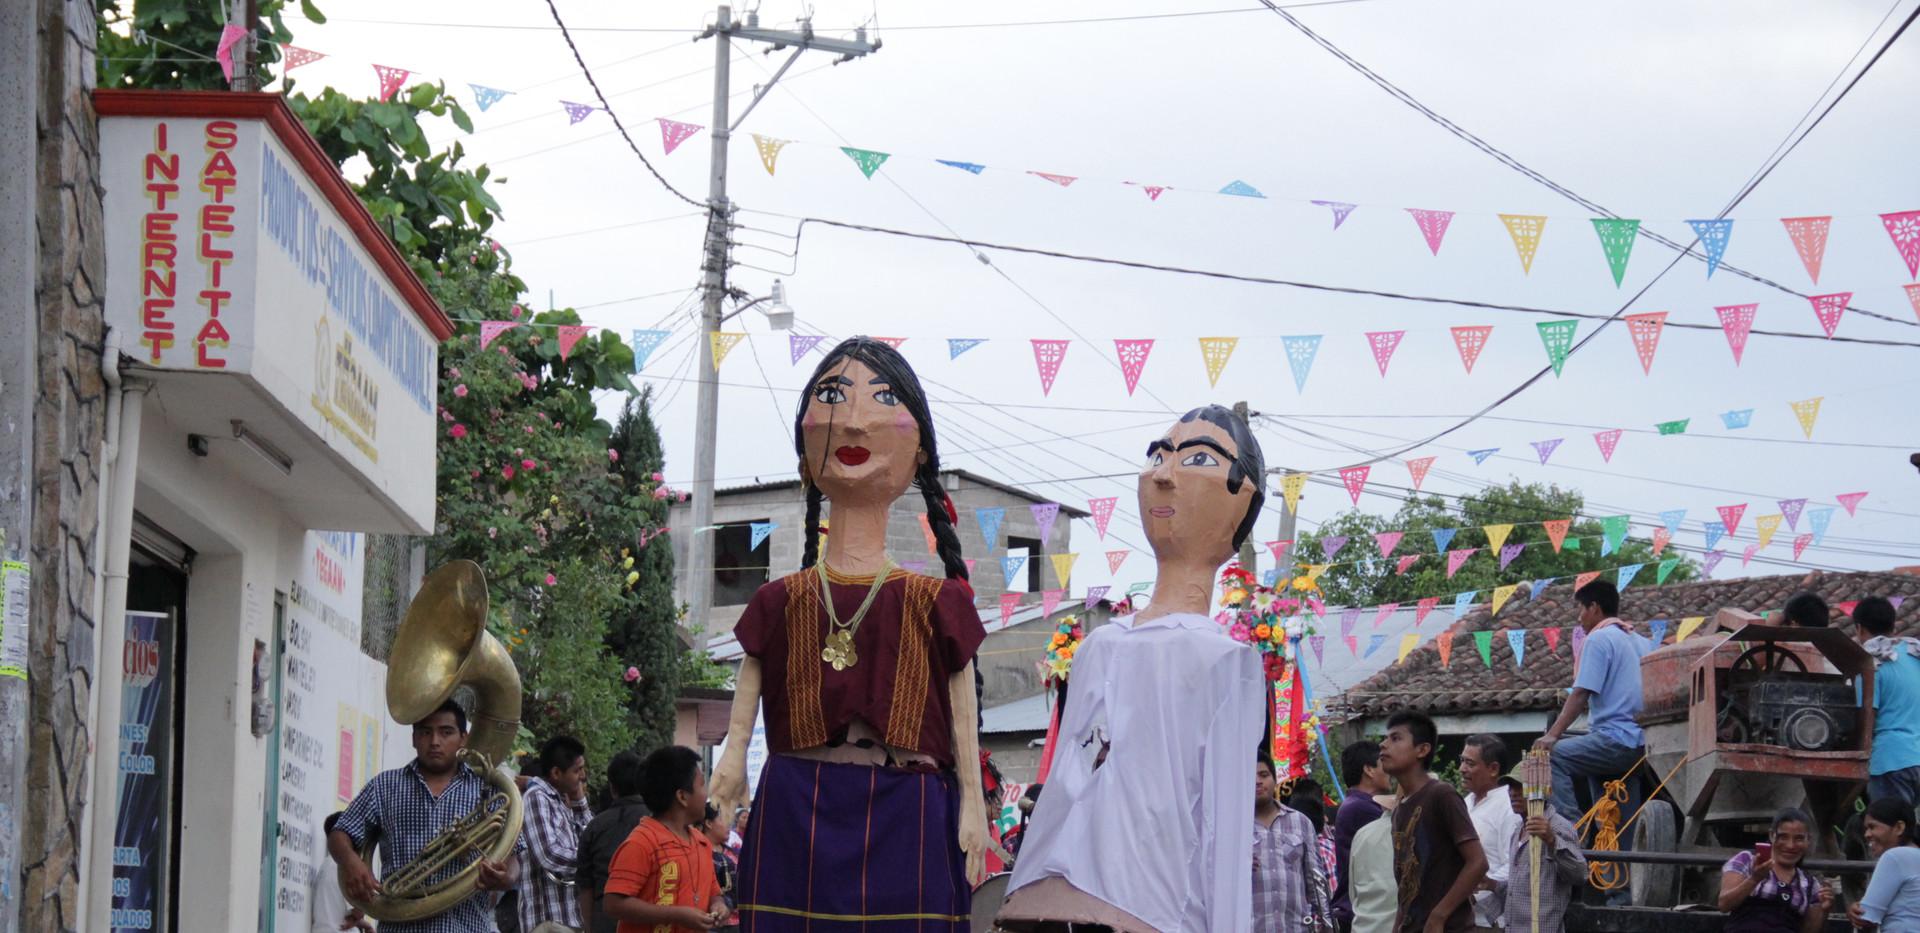 Fiesta San Juan Guichicovi